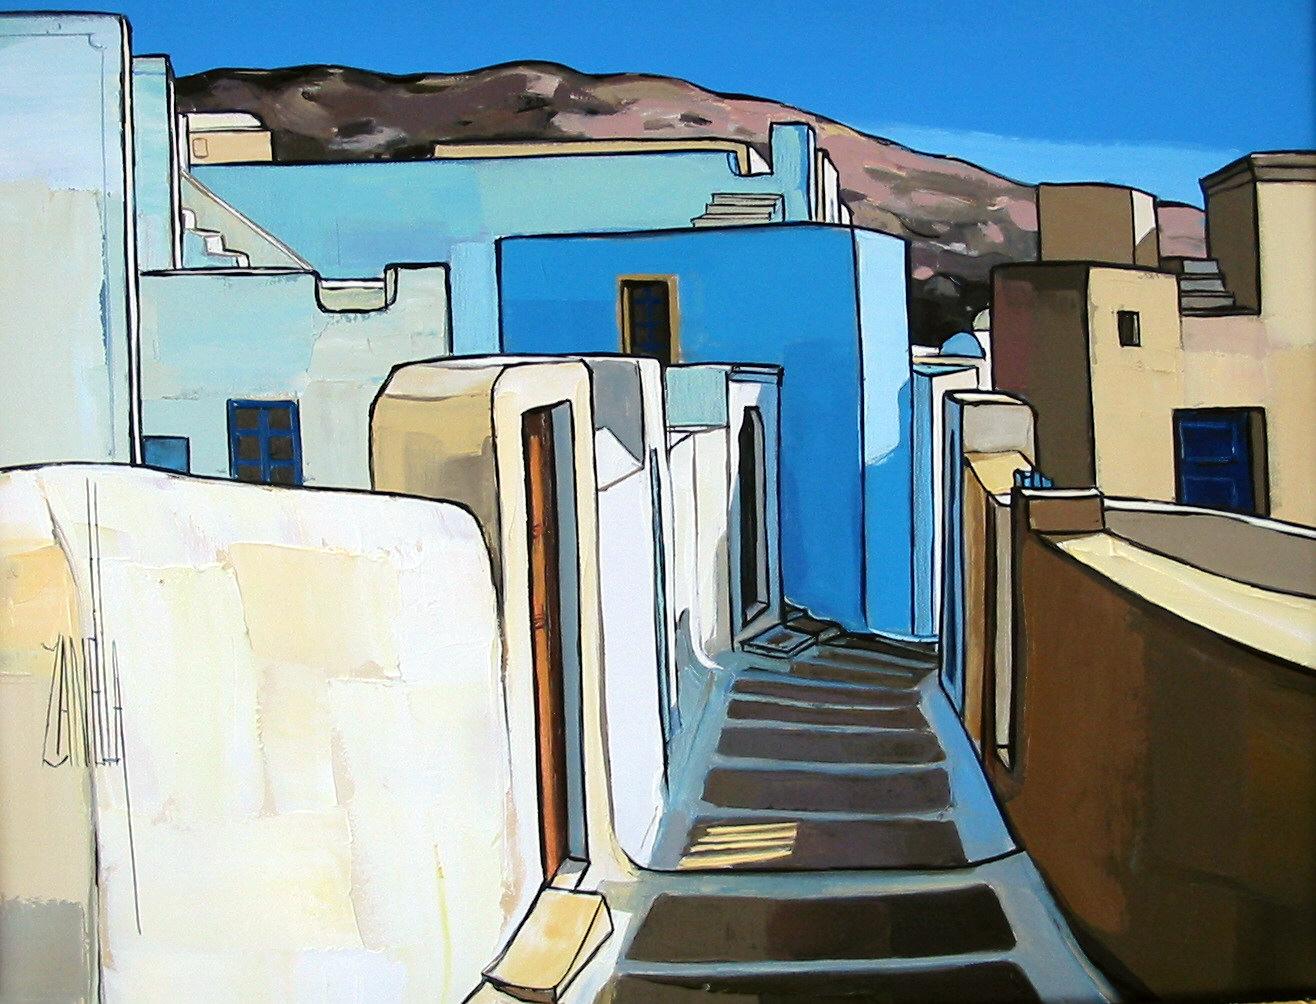 2005-Emborio-LaMaison Bleue-Santorin-5F